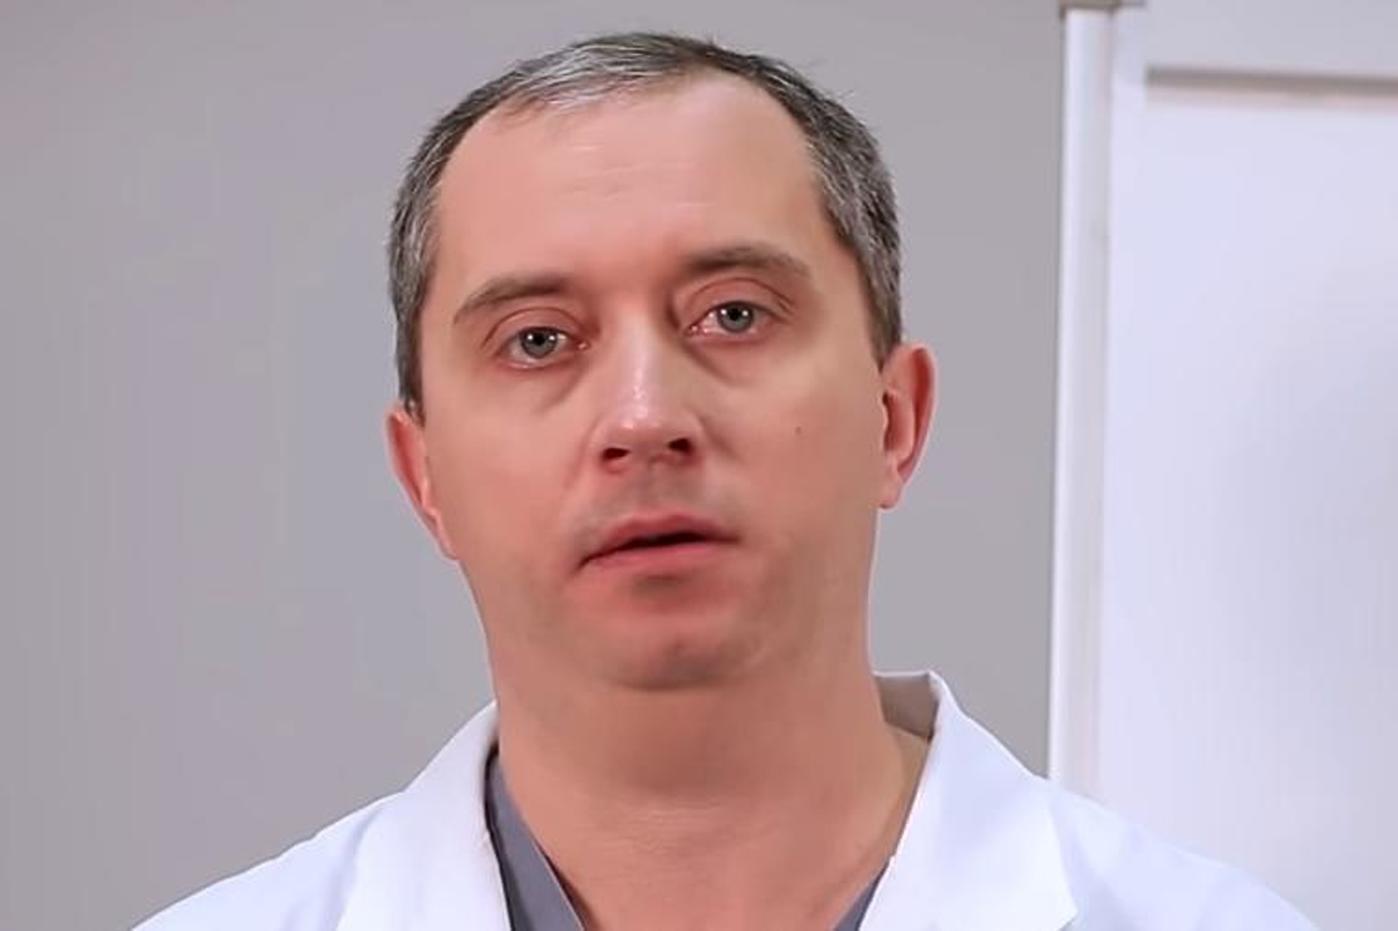 hipertenzija video vrat imam hipertenziju 1 stupanj